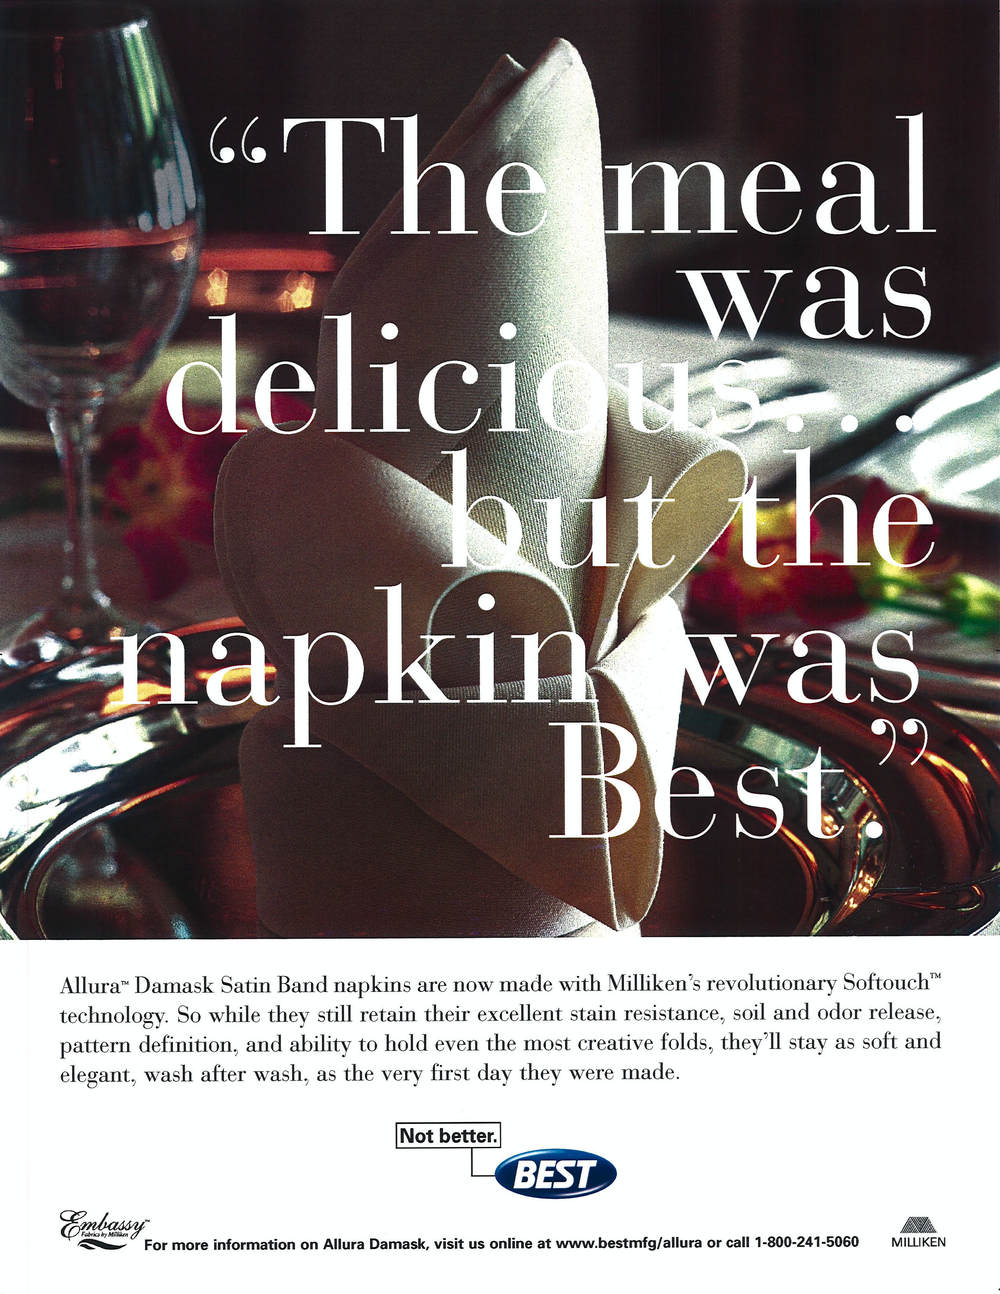 Best Napkins print ad 2.jpg